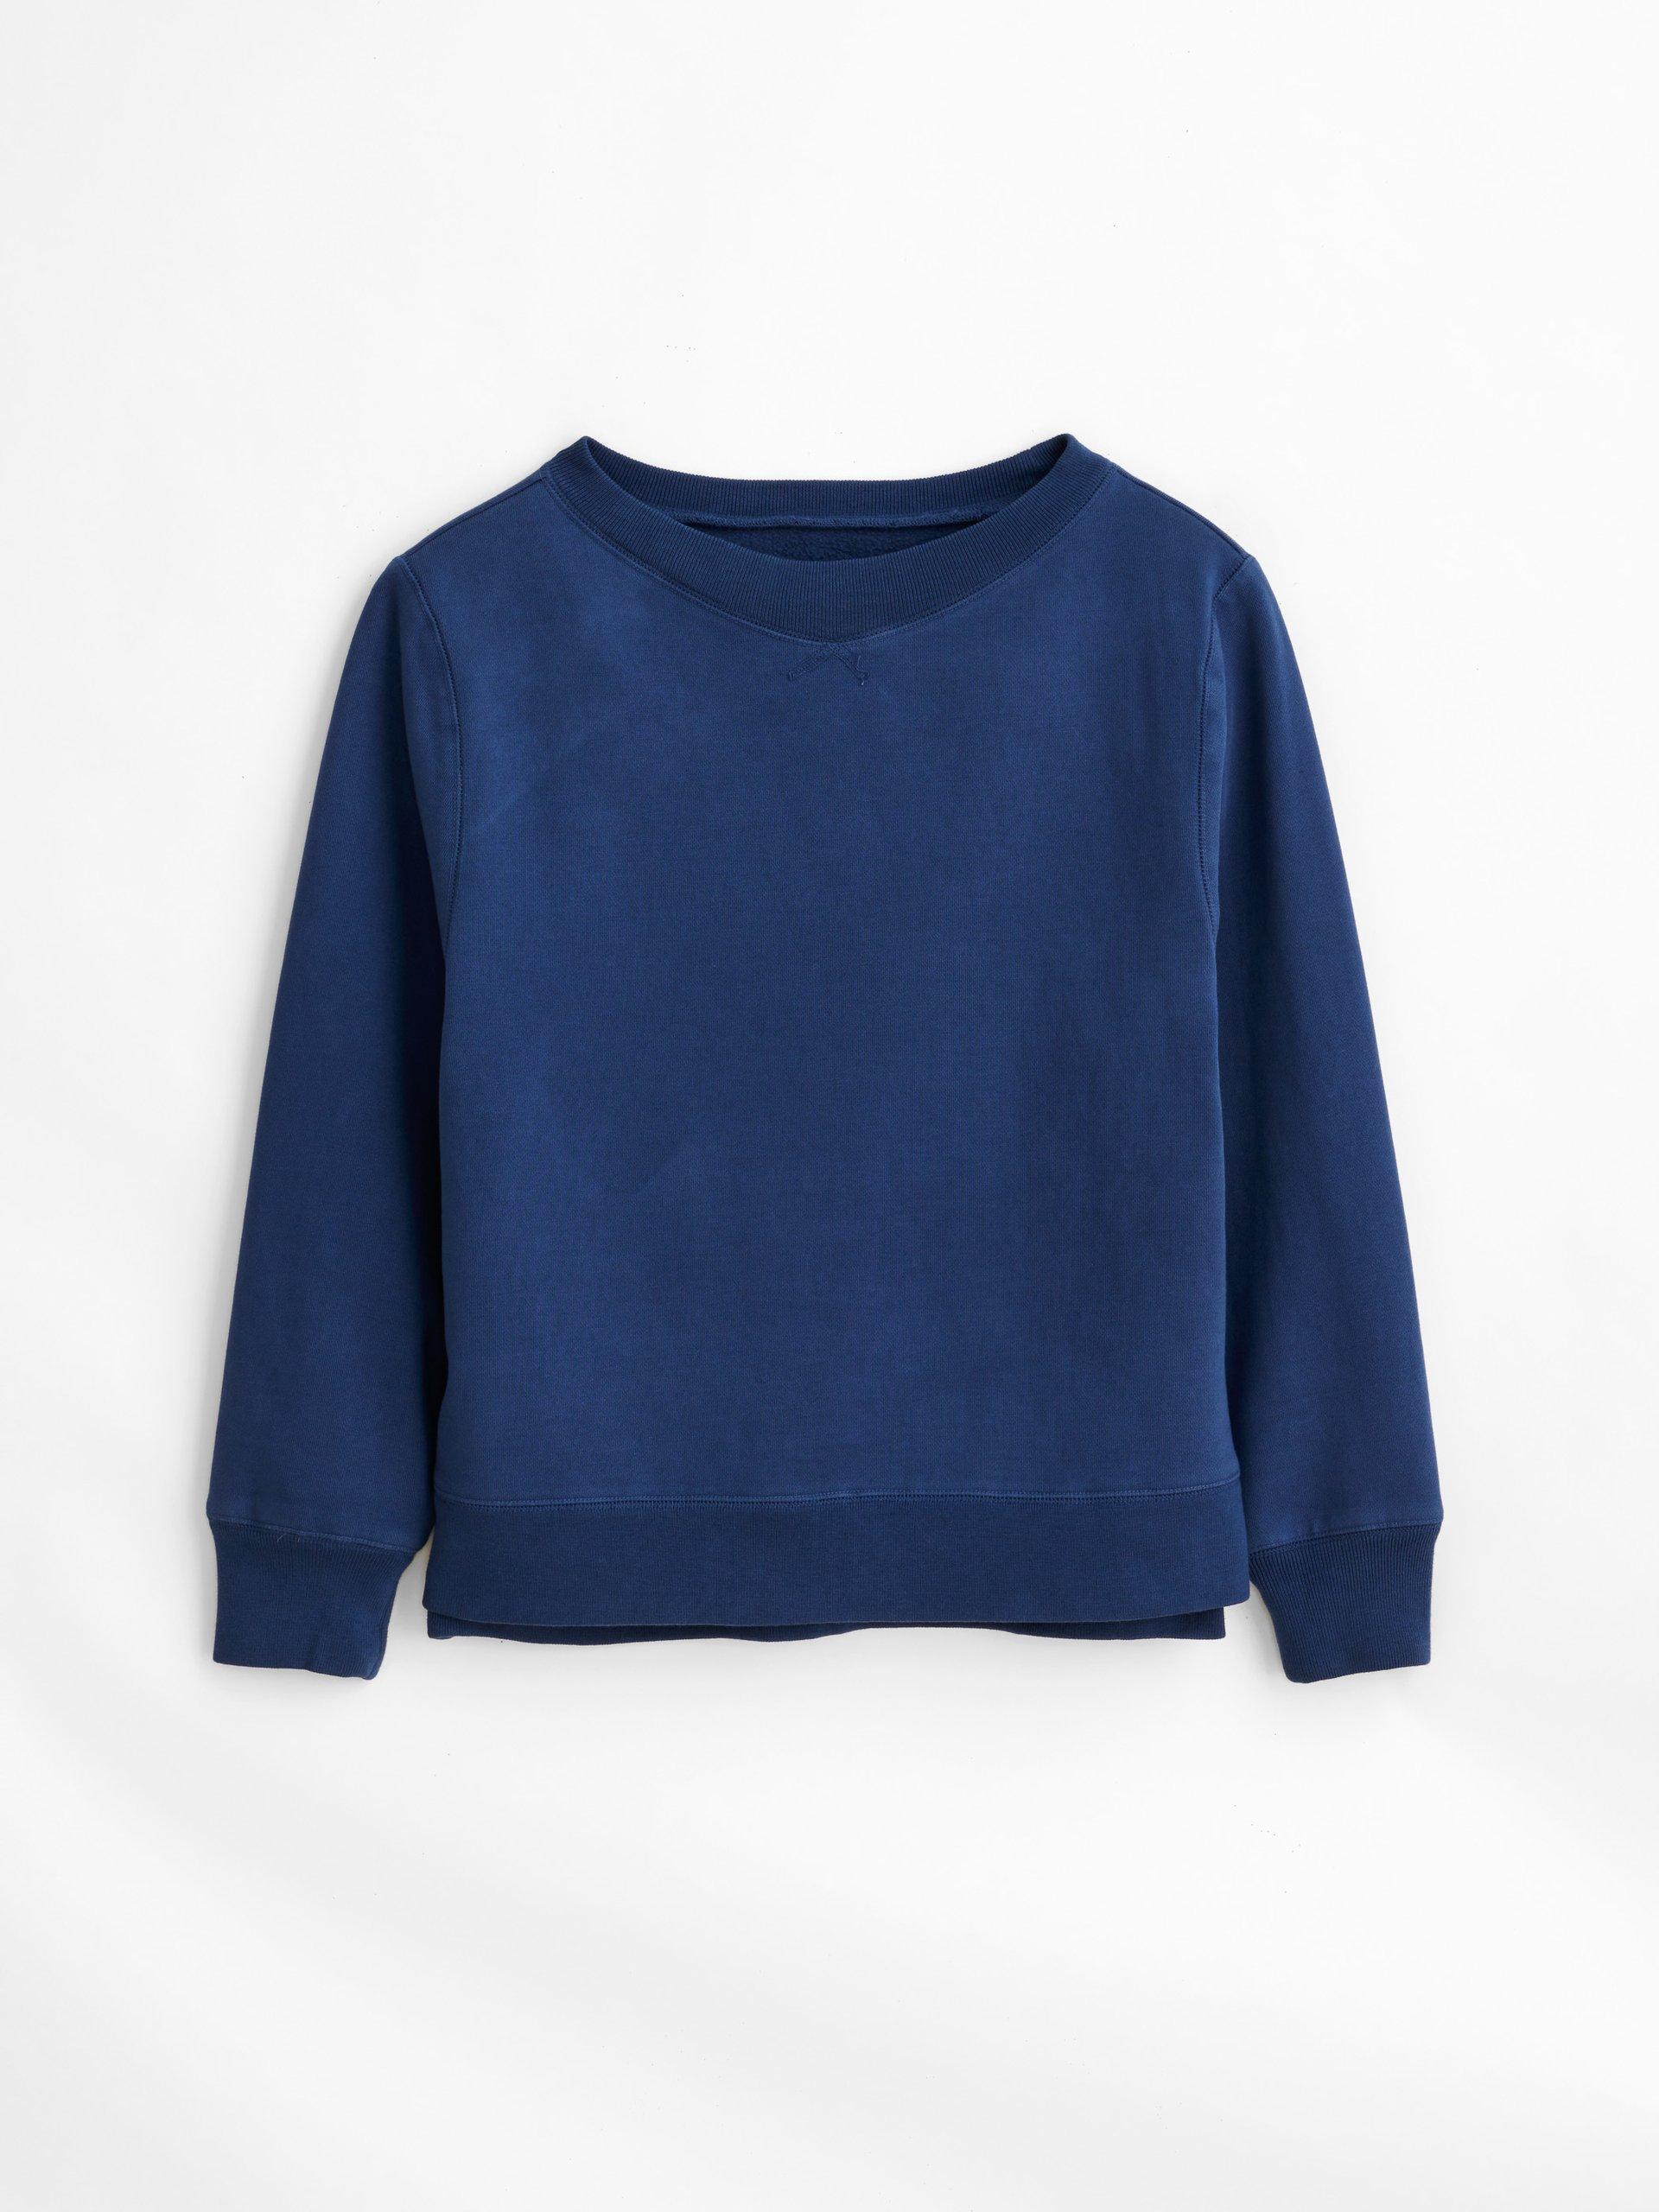 Lakeside Sweatshirt Item # 212-WK072-2639